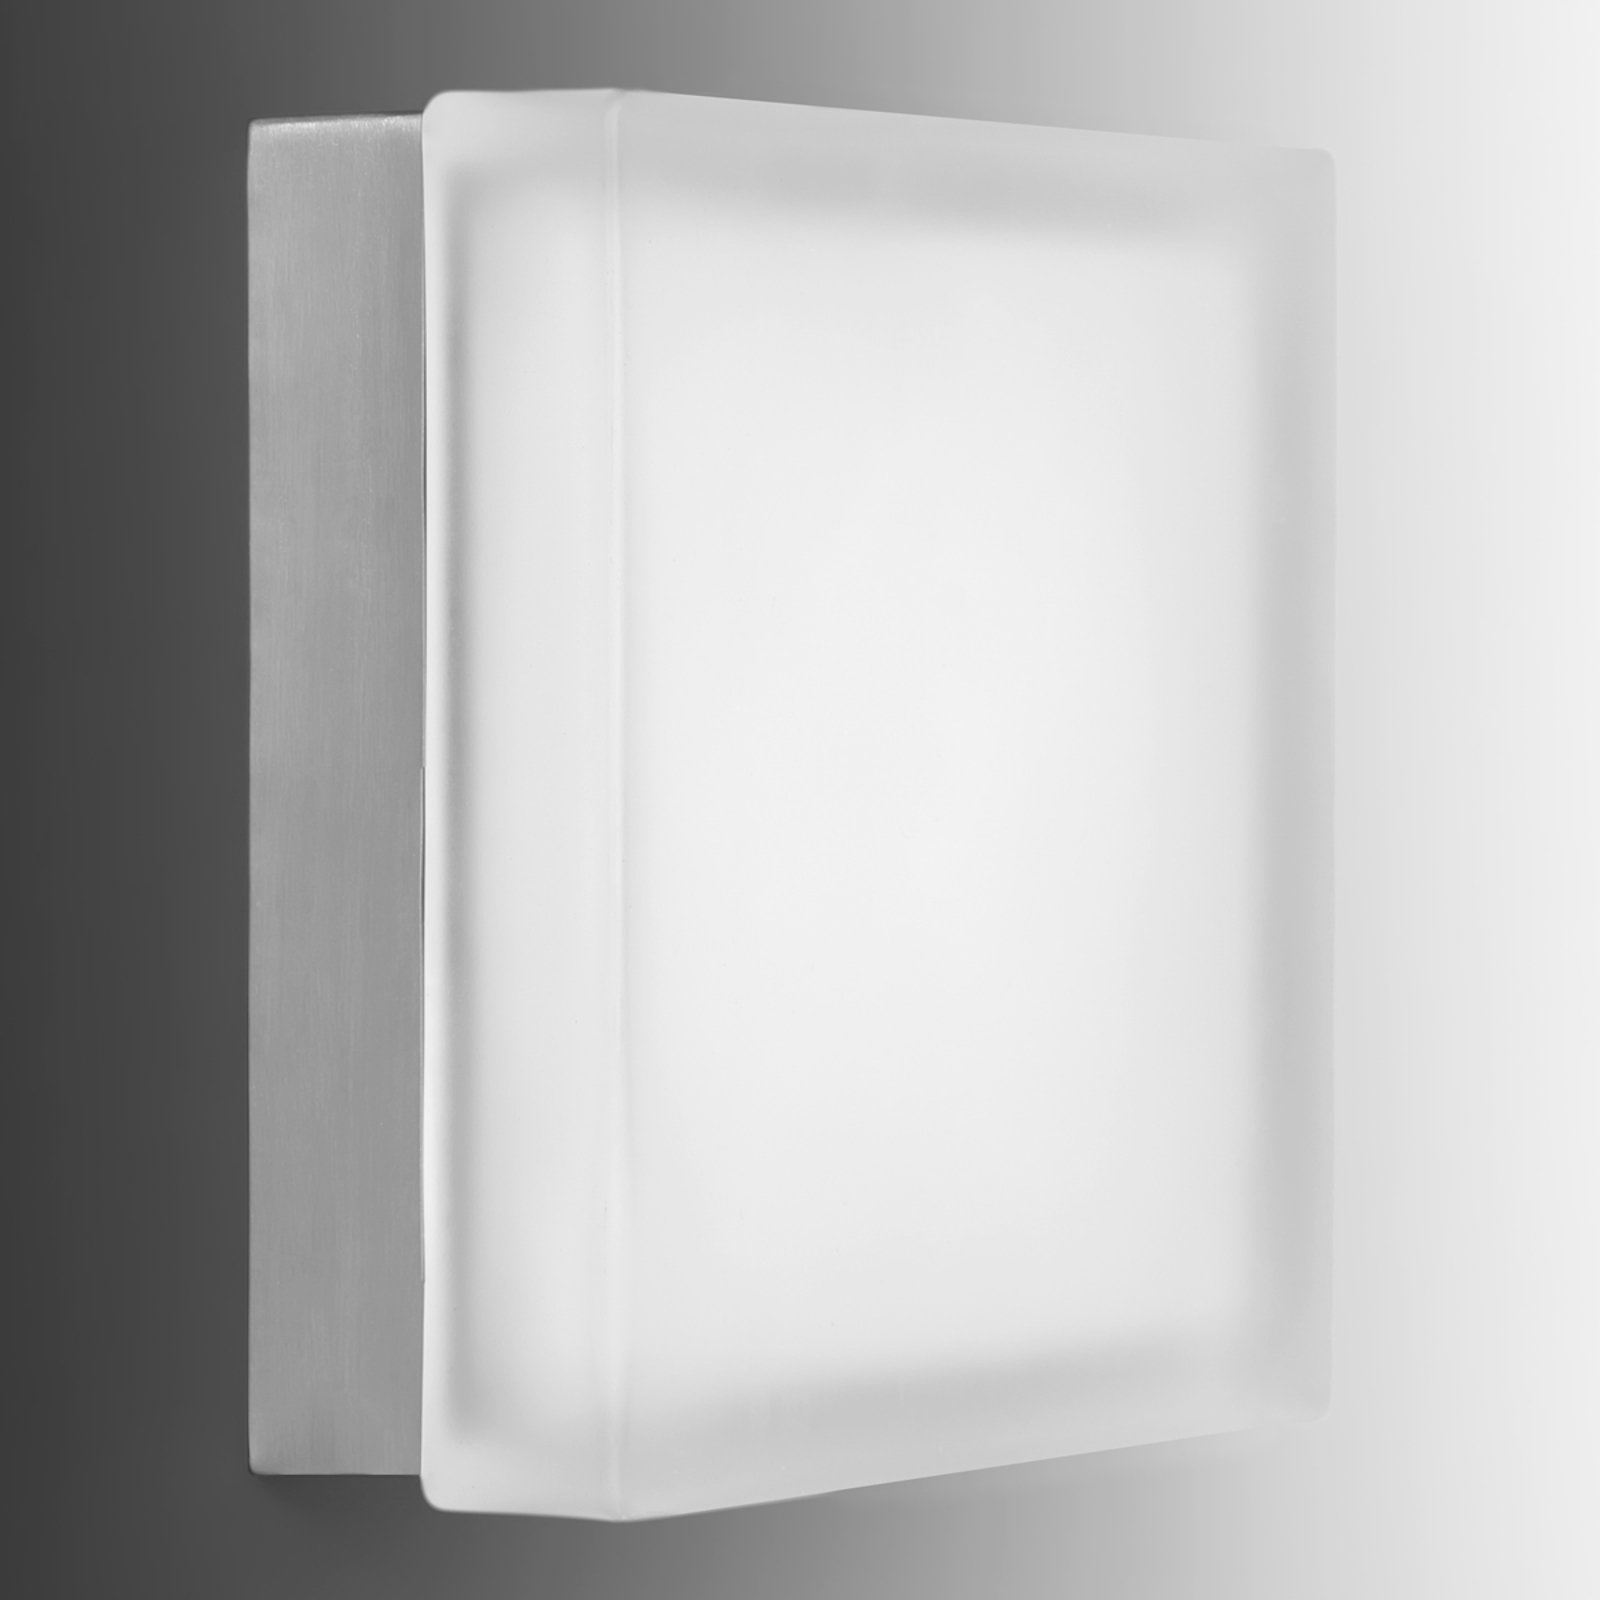 Moderne LED-vegglampe Briq 02L universalhvit